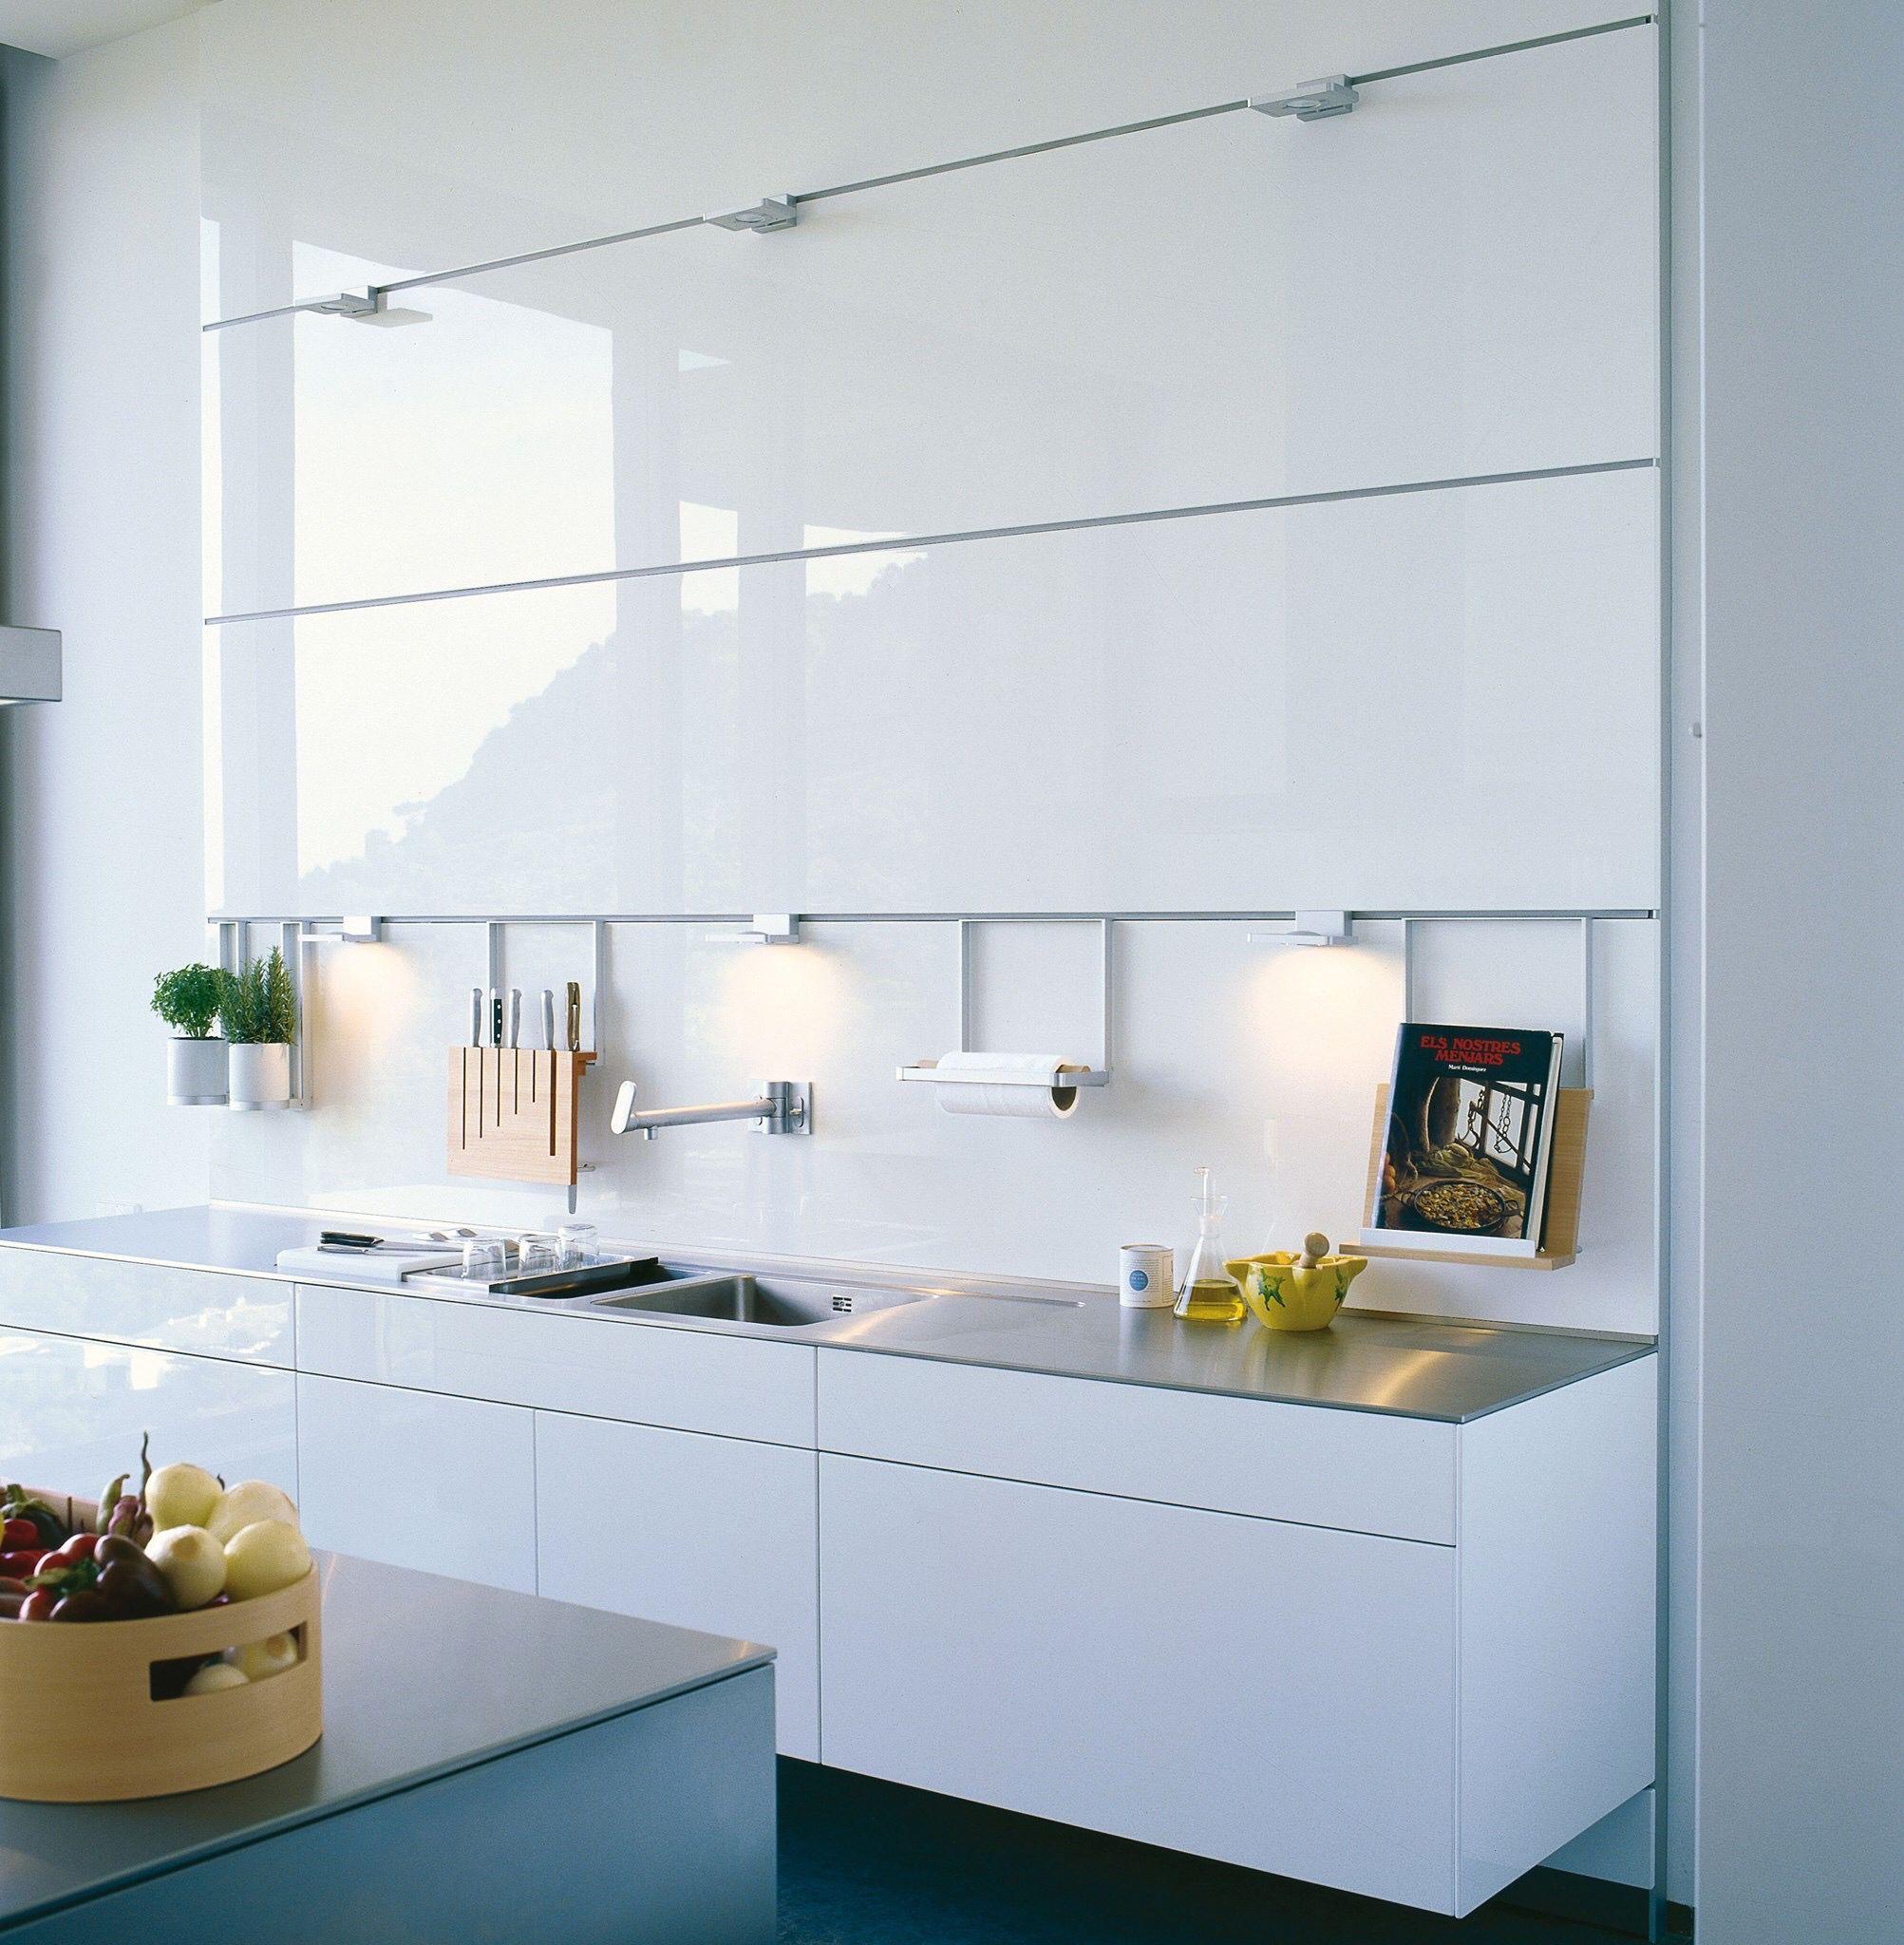 Küche Bulthaup | B3 Bulthaup Ideeen Voor Het Huis Pinterest Kitchens